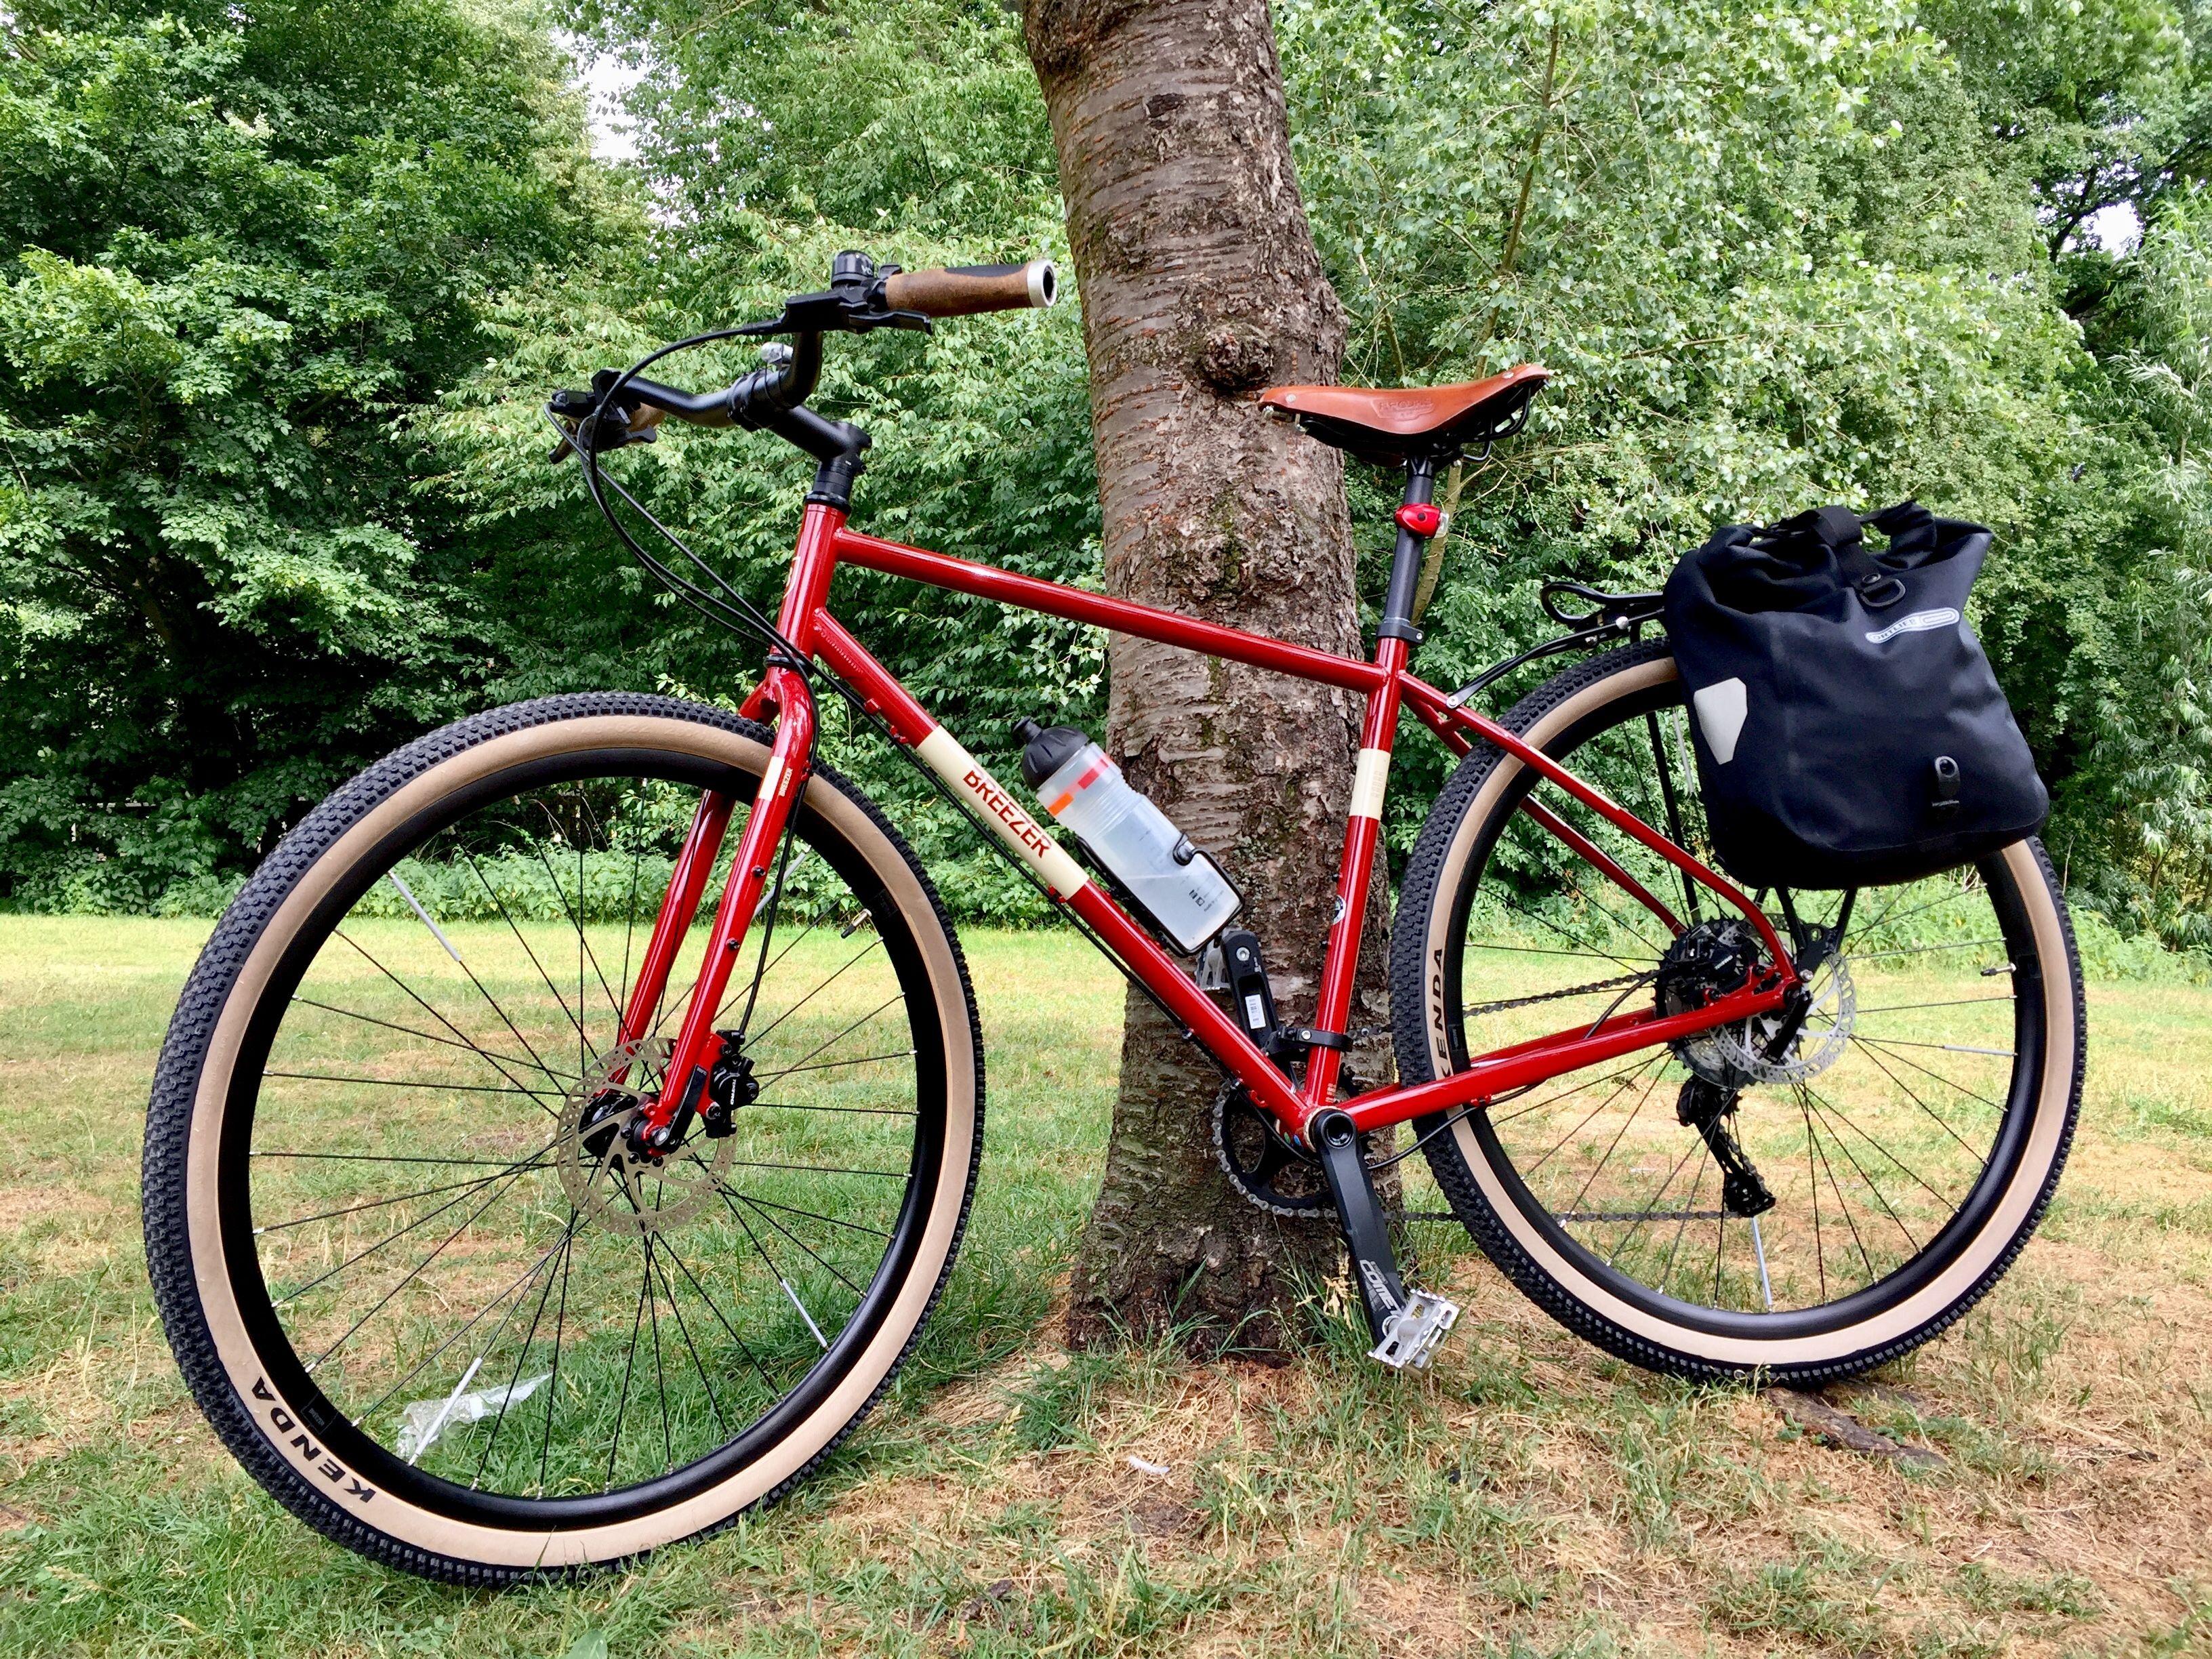 6a8be9eca93 Breezer Radar Cafe | My Bikes